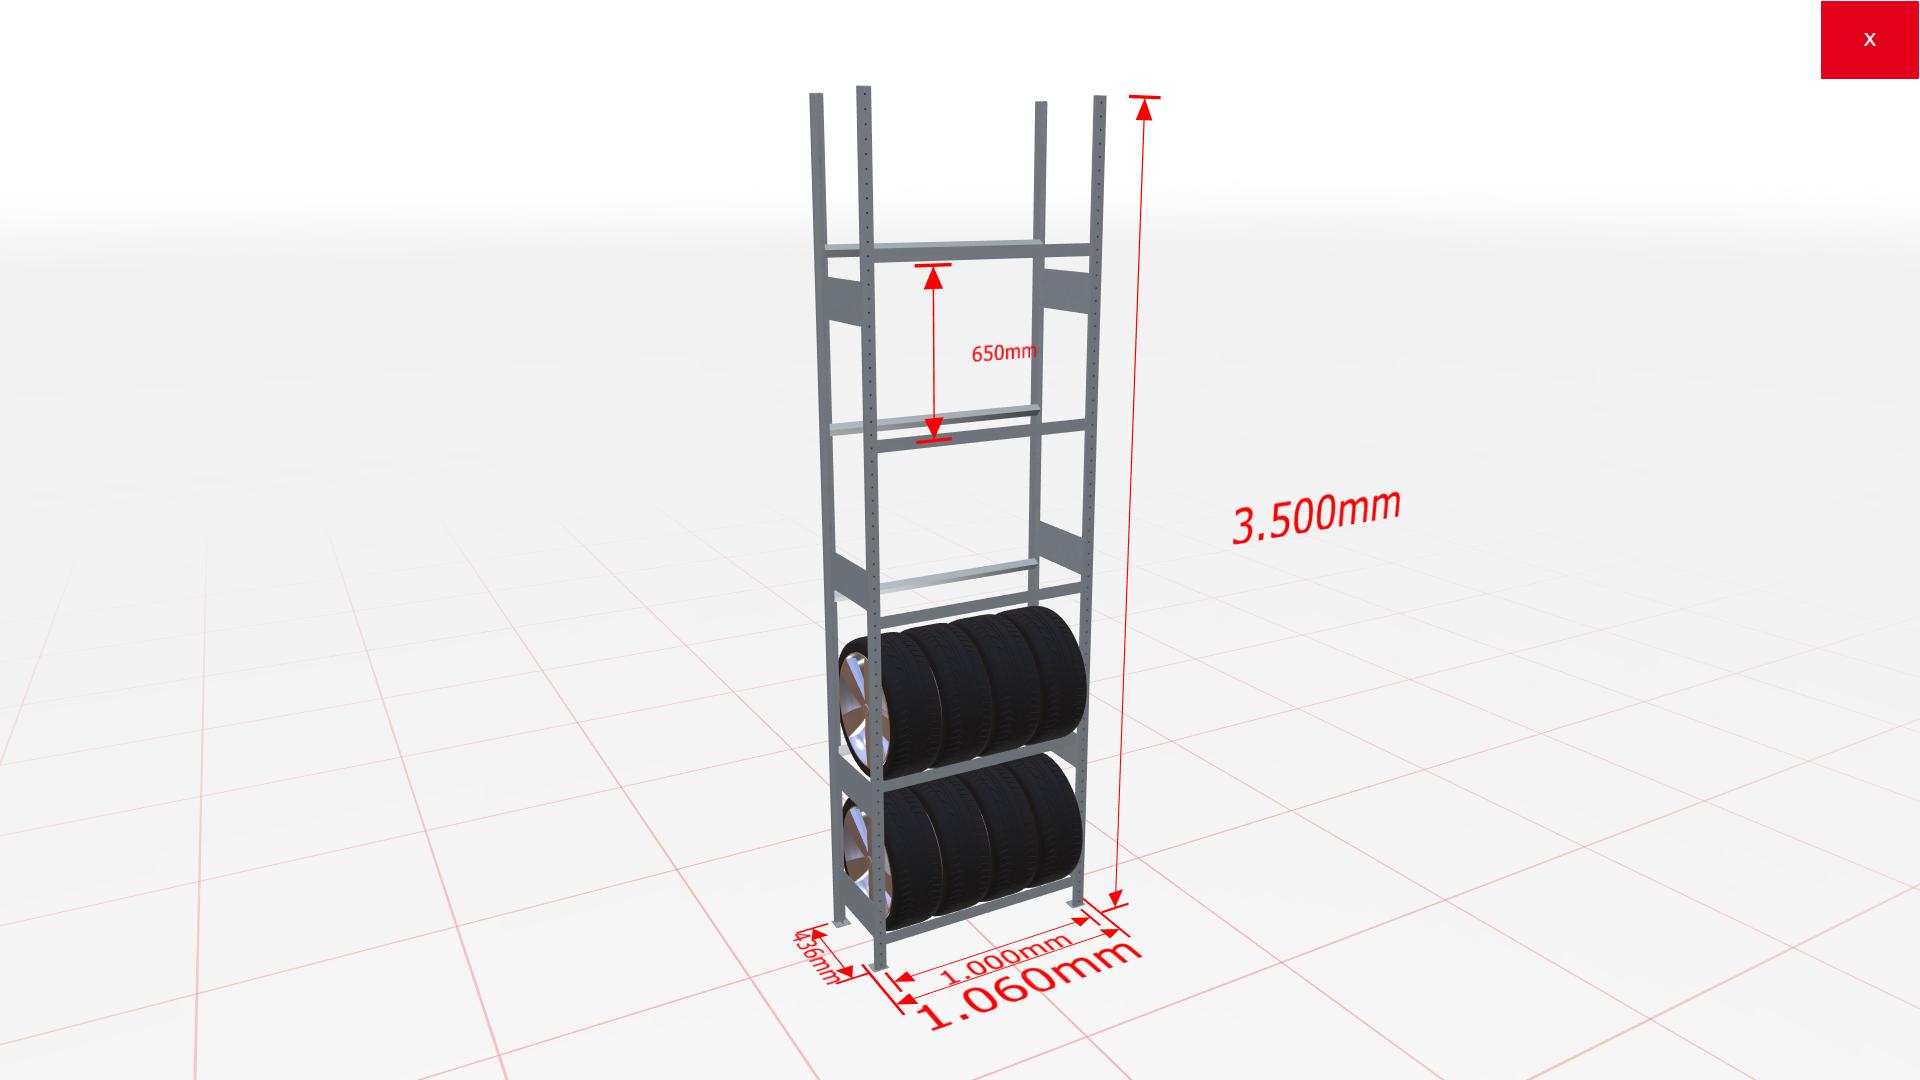 Räderregal Grundregal SCHULTE Lagertechnik 3500x1000x400 mm – 5 Ebenen á 1000 mm, verzinkt